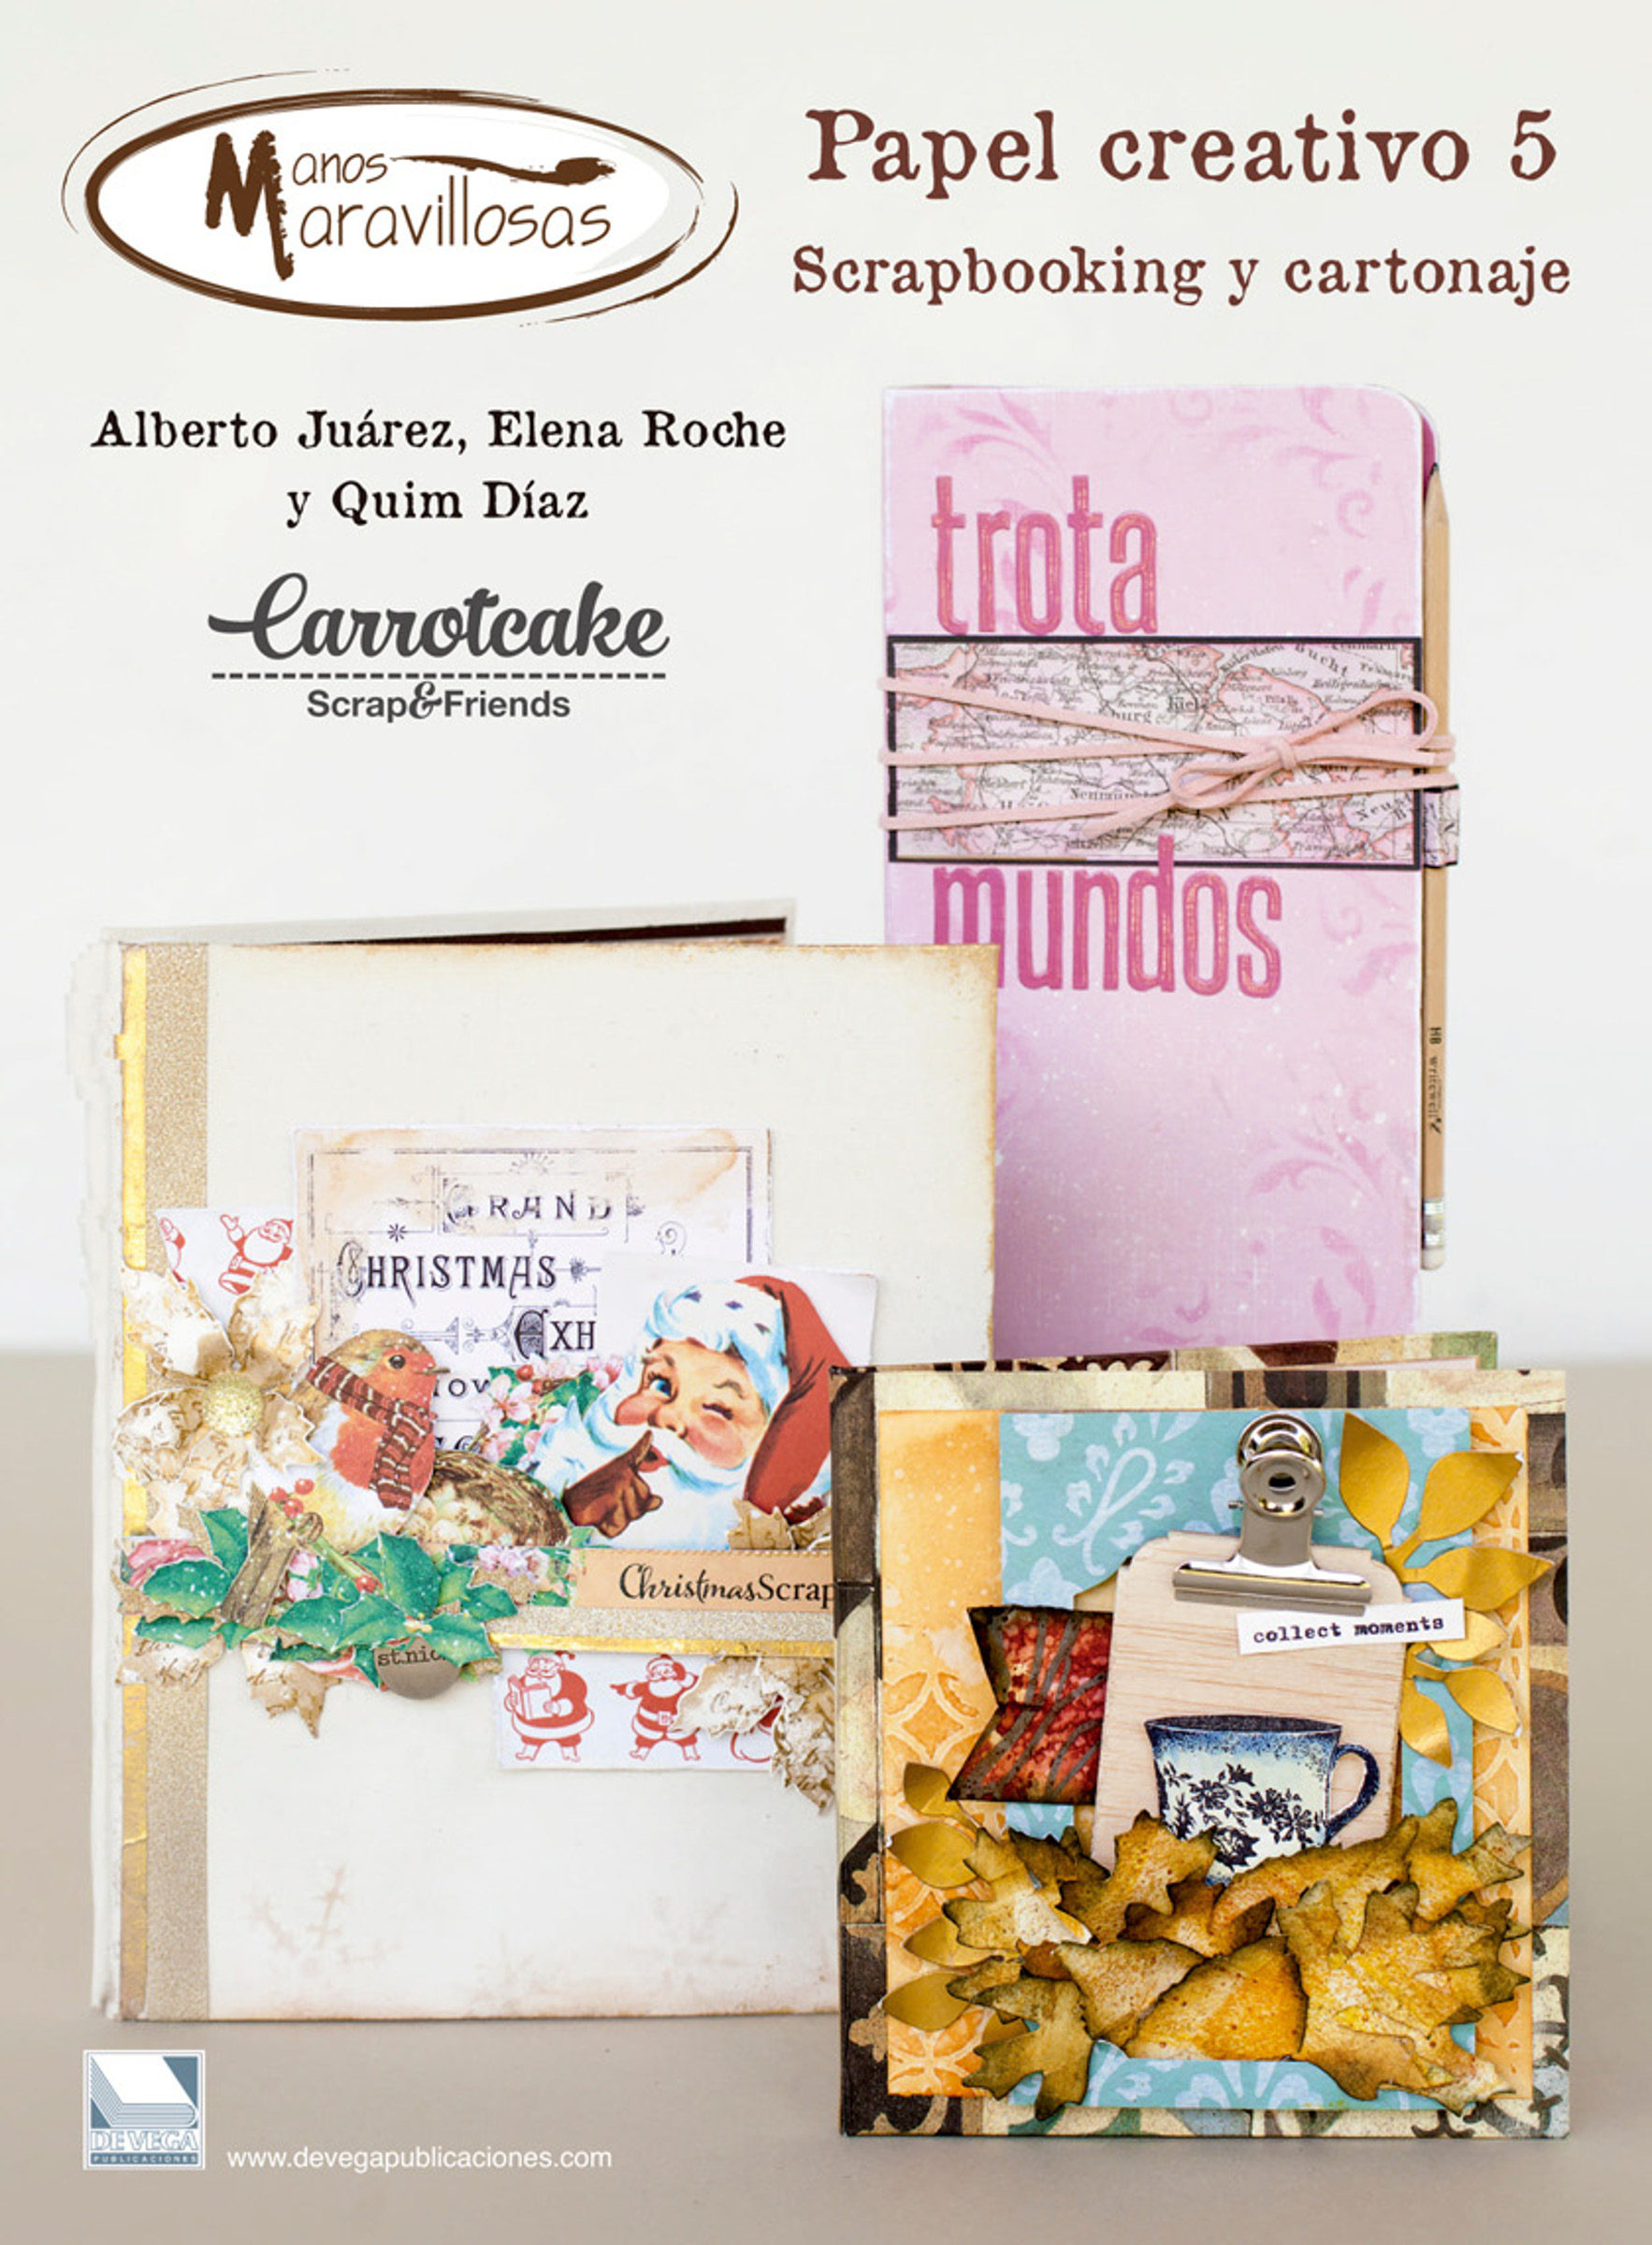 Papel Creativo 5 Manos Maravillosas   por Alberto Juarez, Elena Roche, Quim Diaz epub